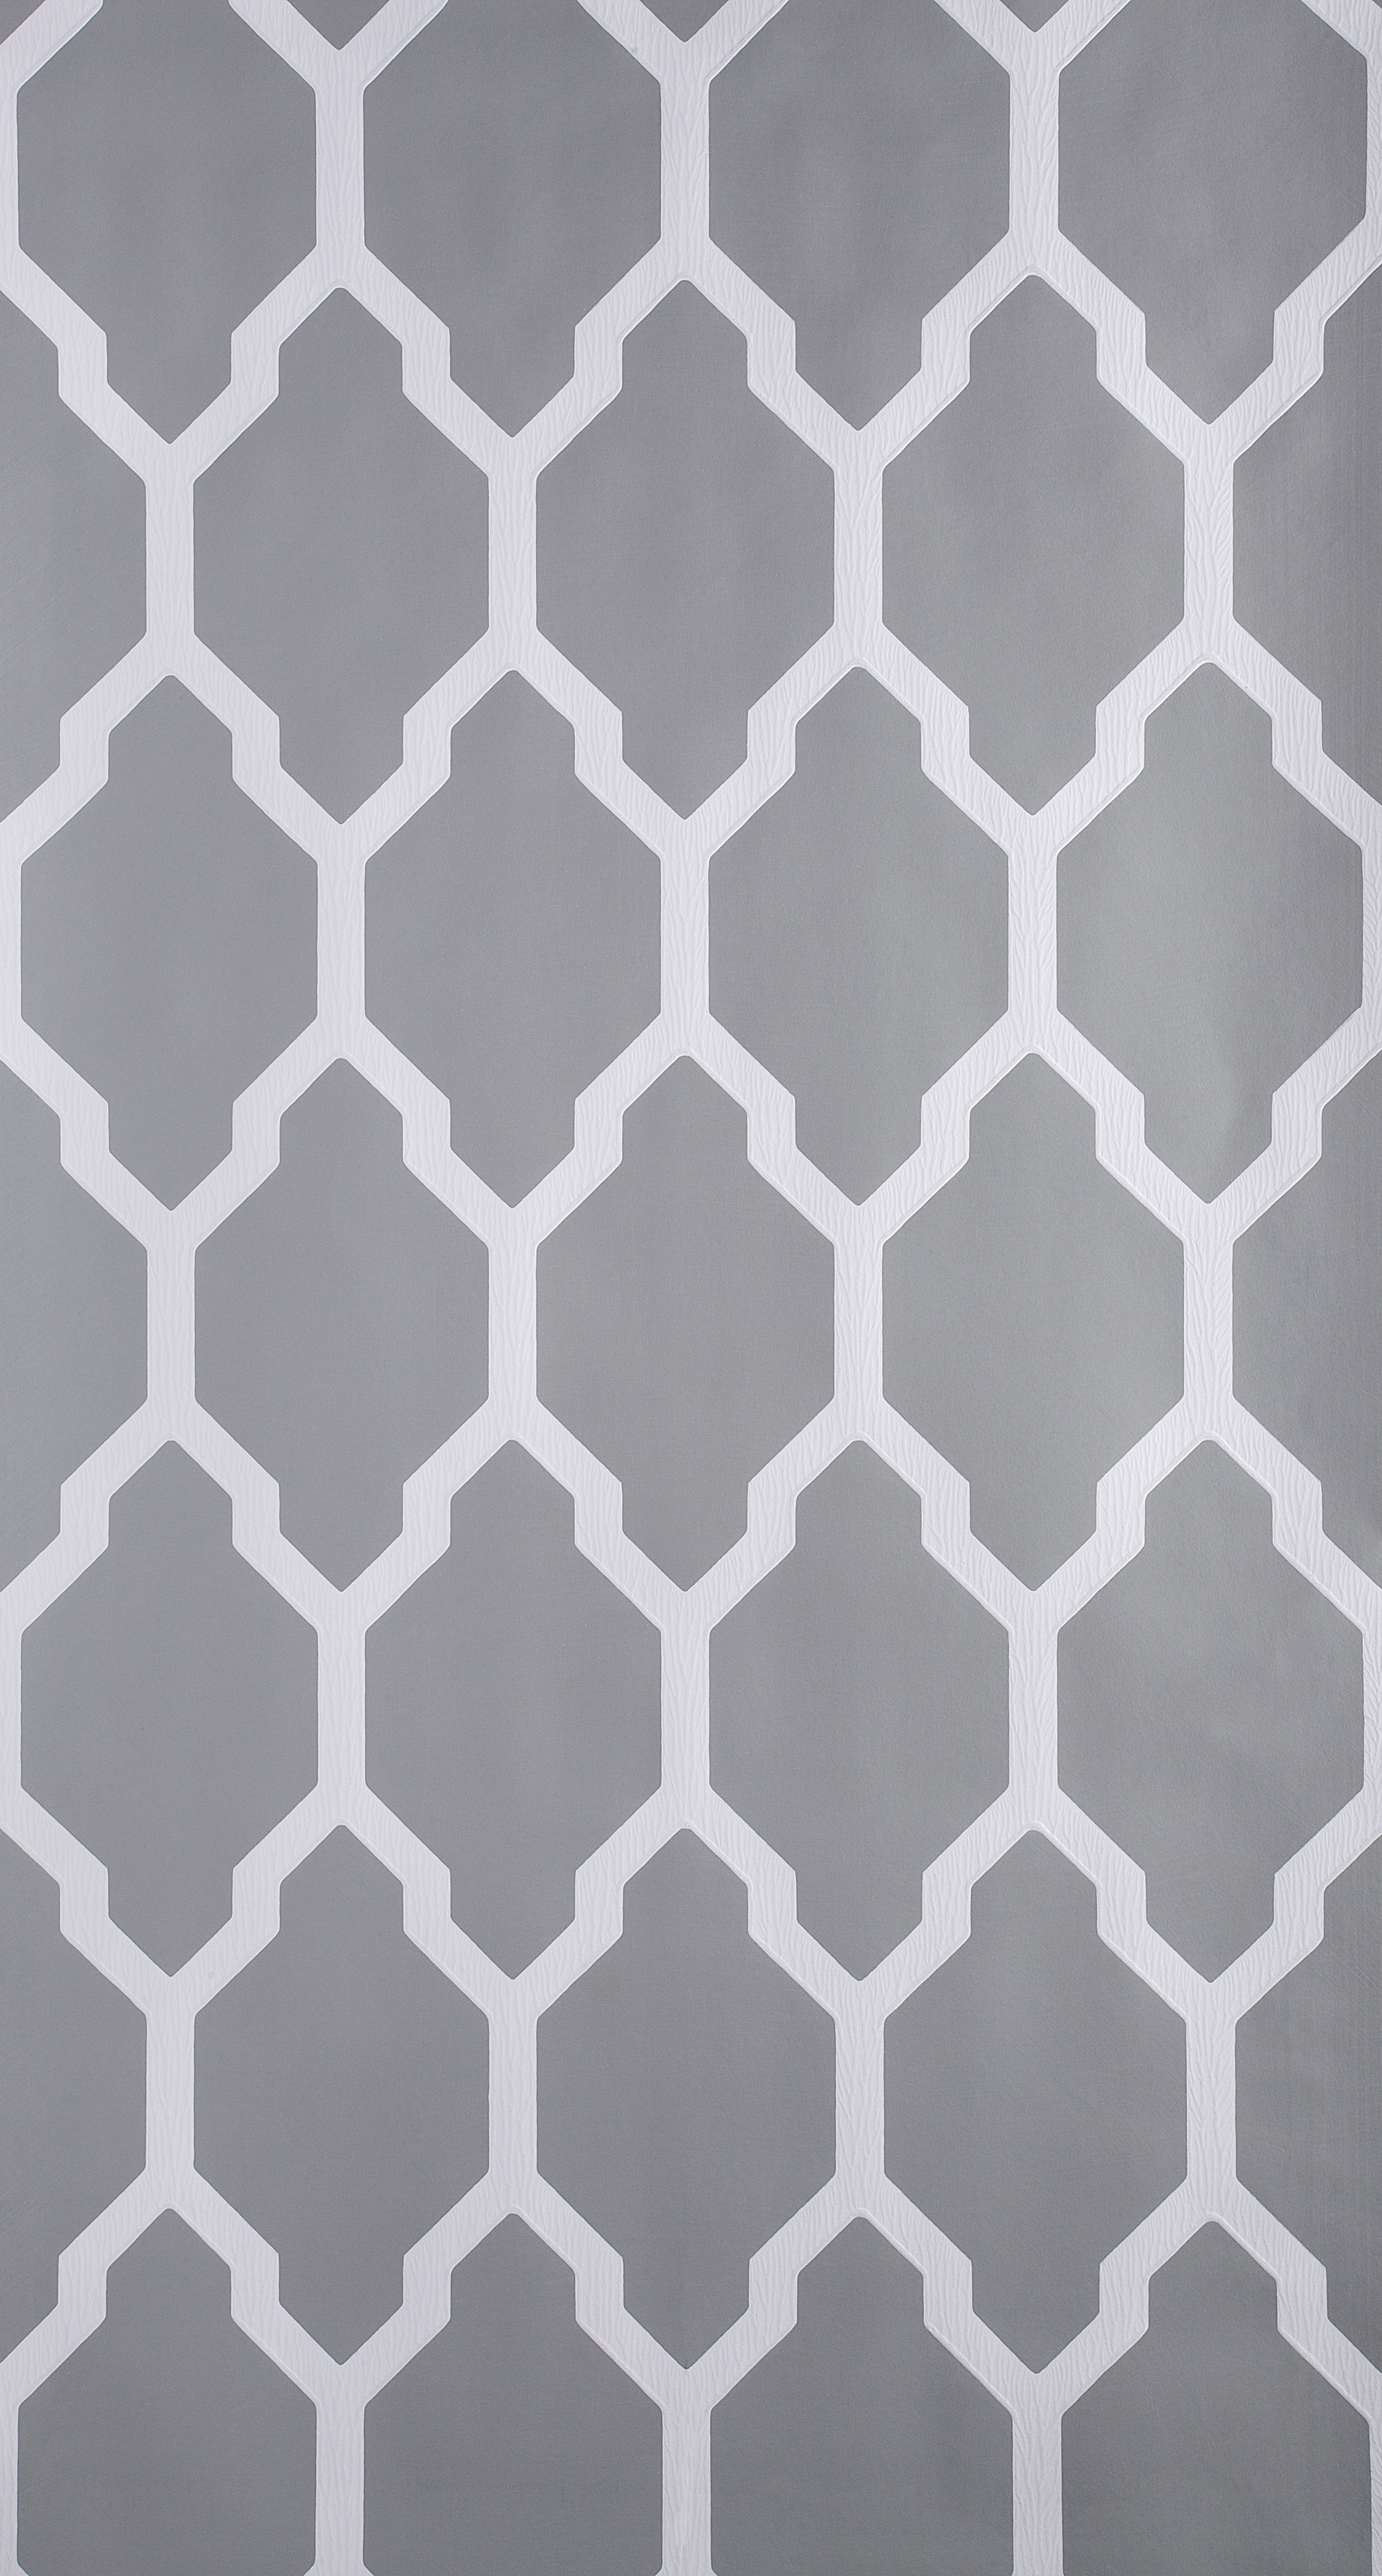 Tessella 3602 $250 Per Roll  Order Now